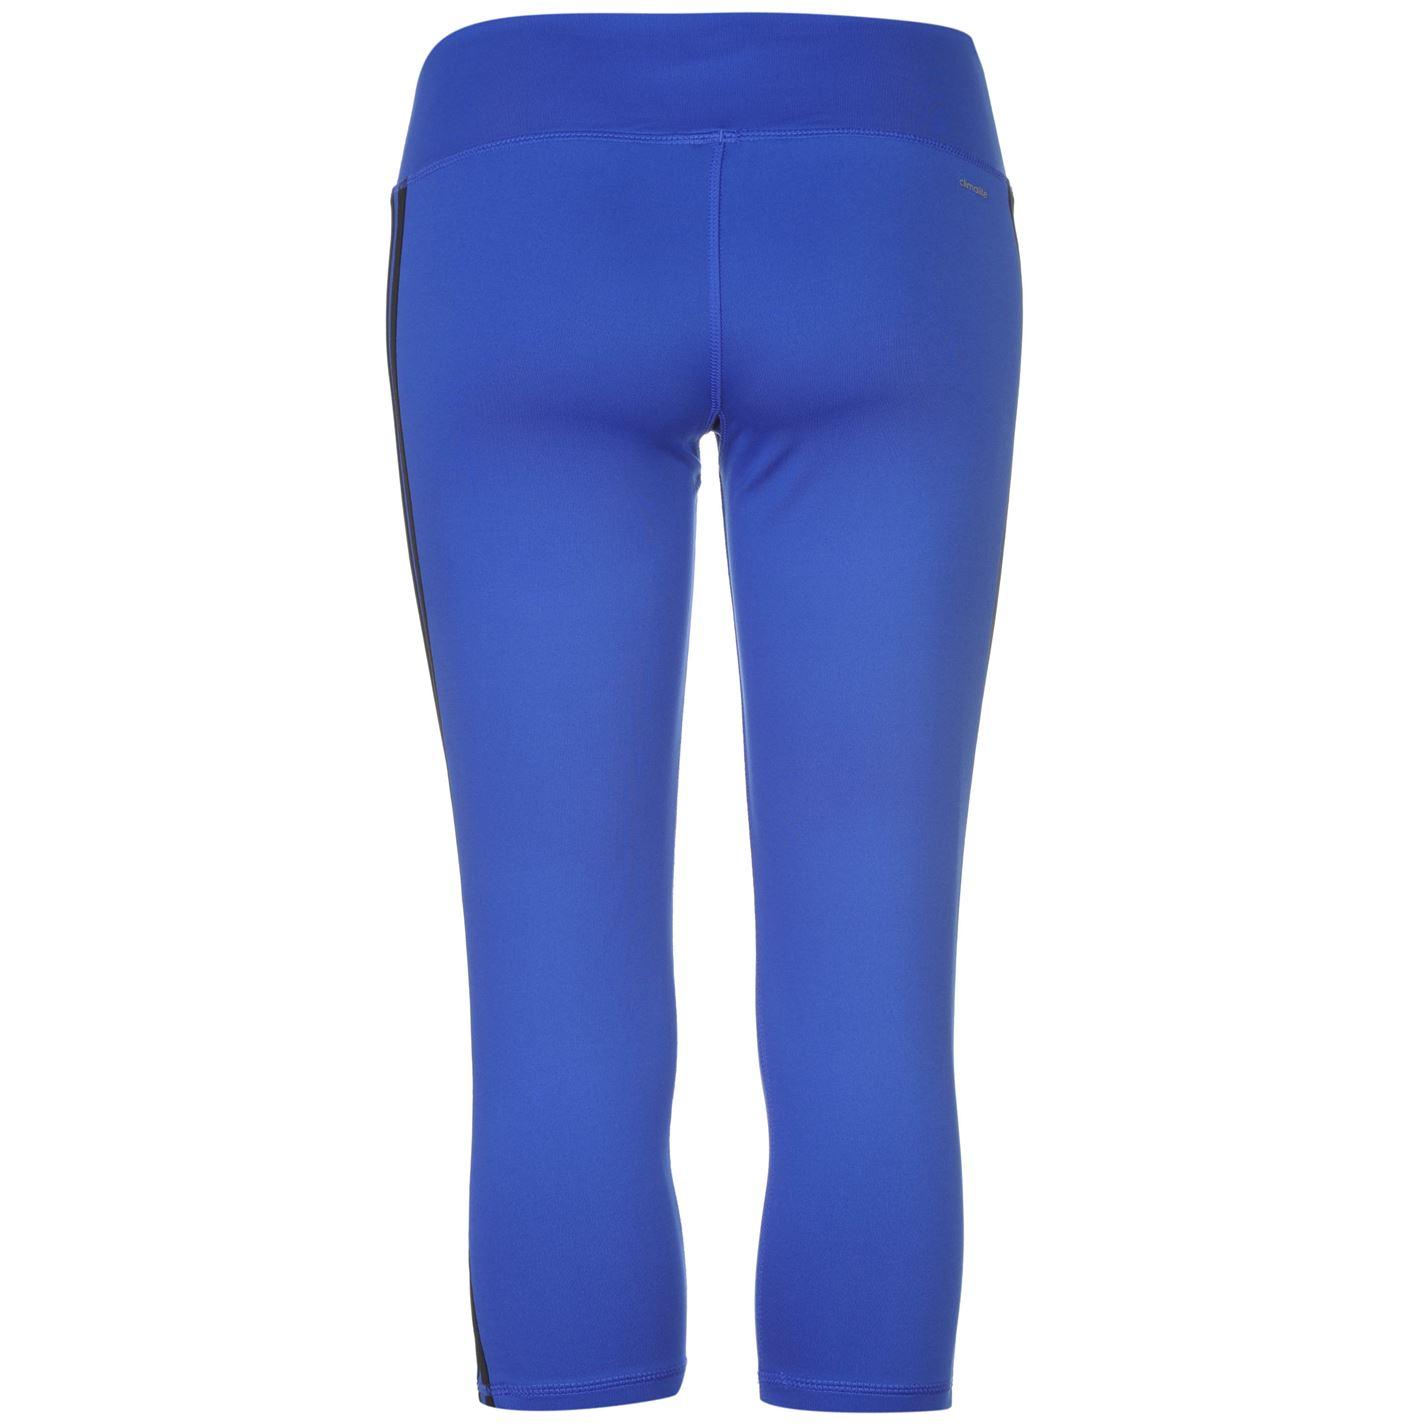 cf1cf2b2b3d88 adidas Womens 3S 3/4 Tight Ladies Elastic Sports Pants Training ...